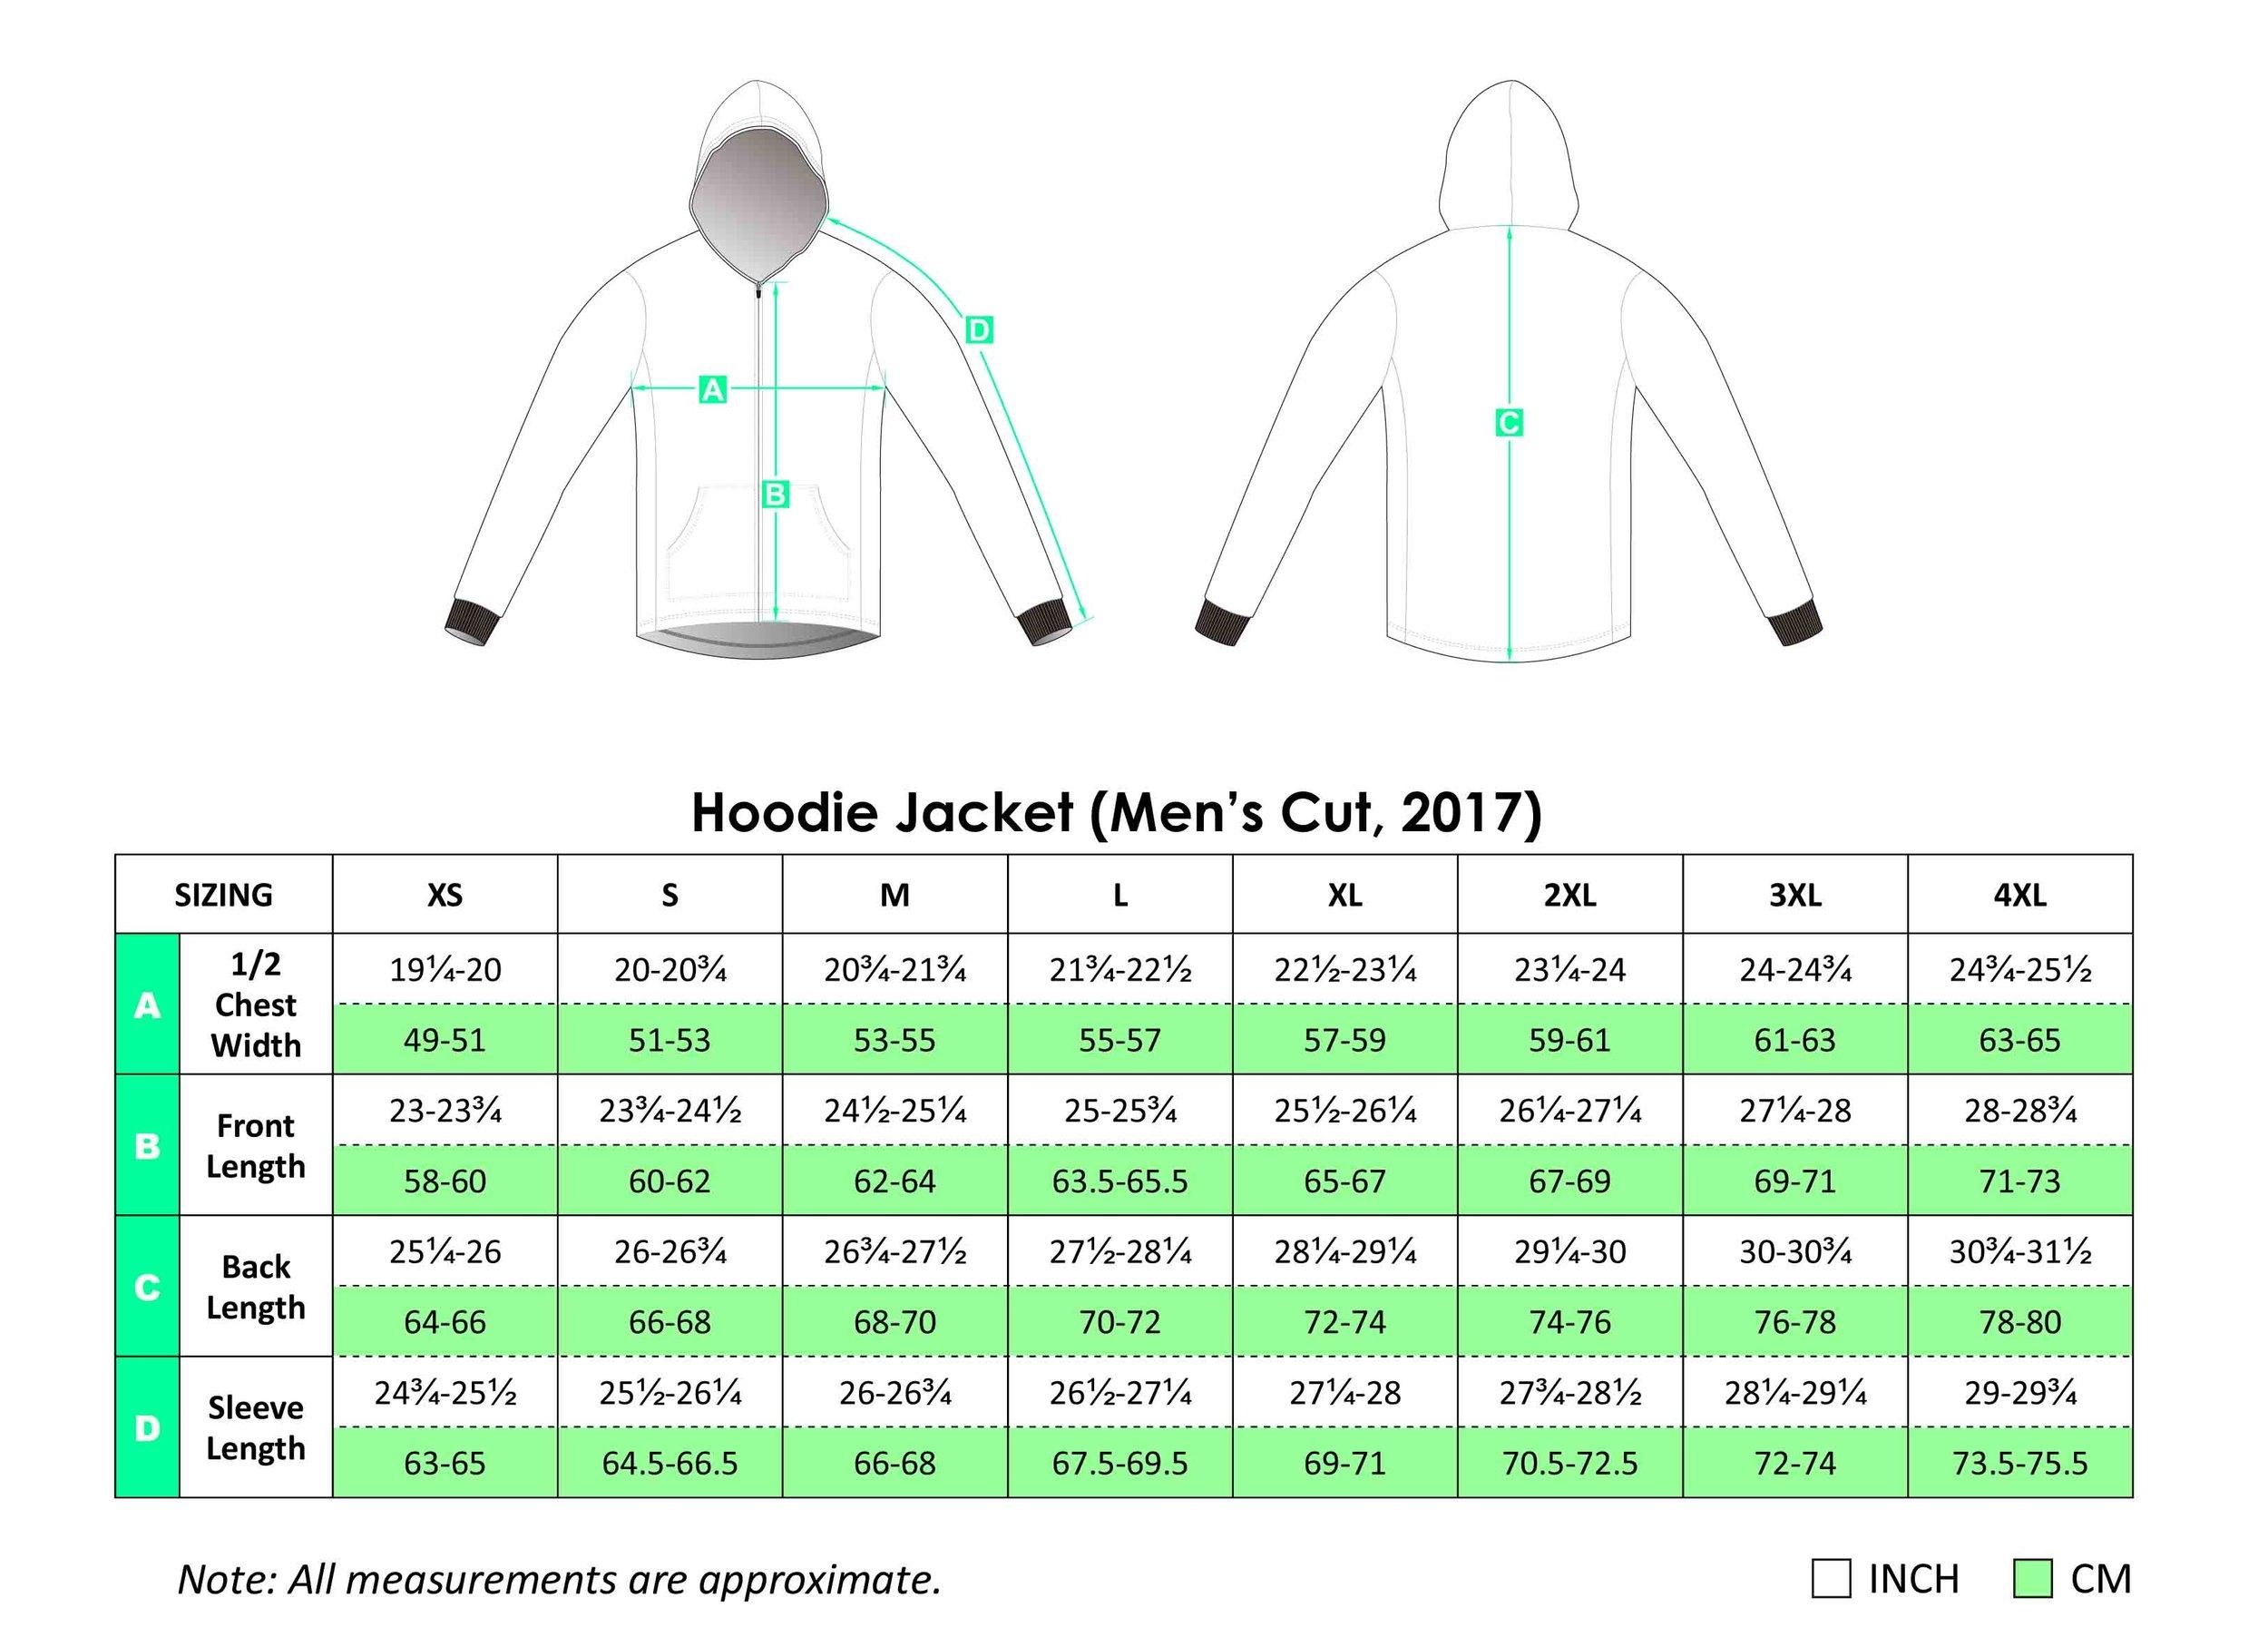 Hoodie Jacket size chart.jpg